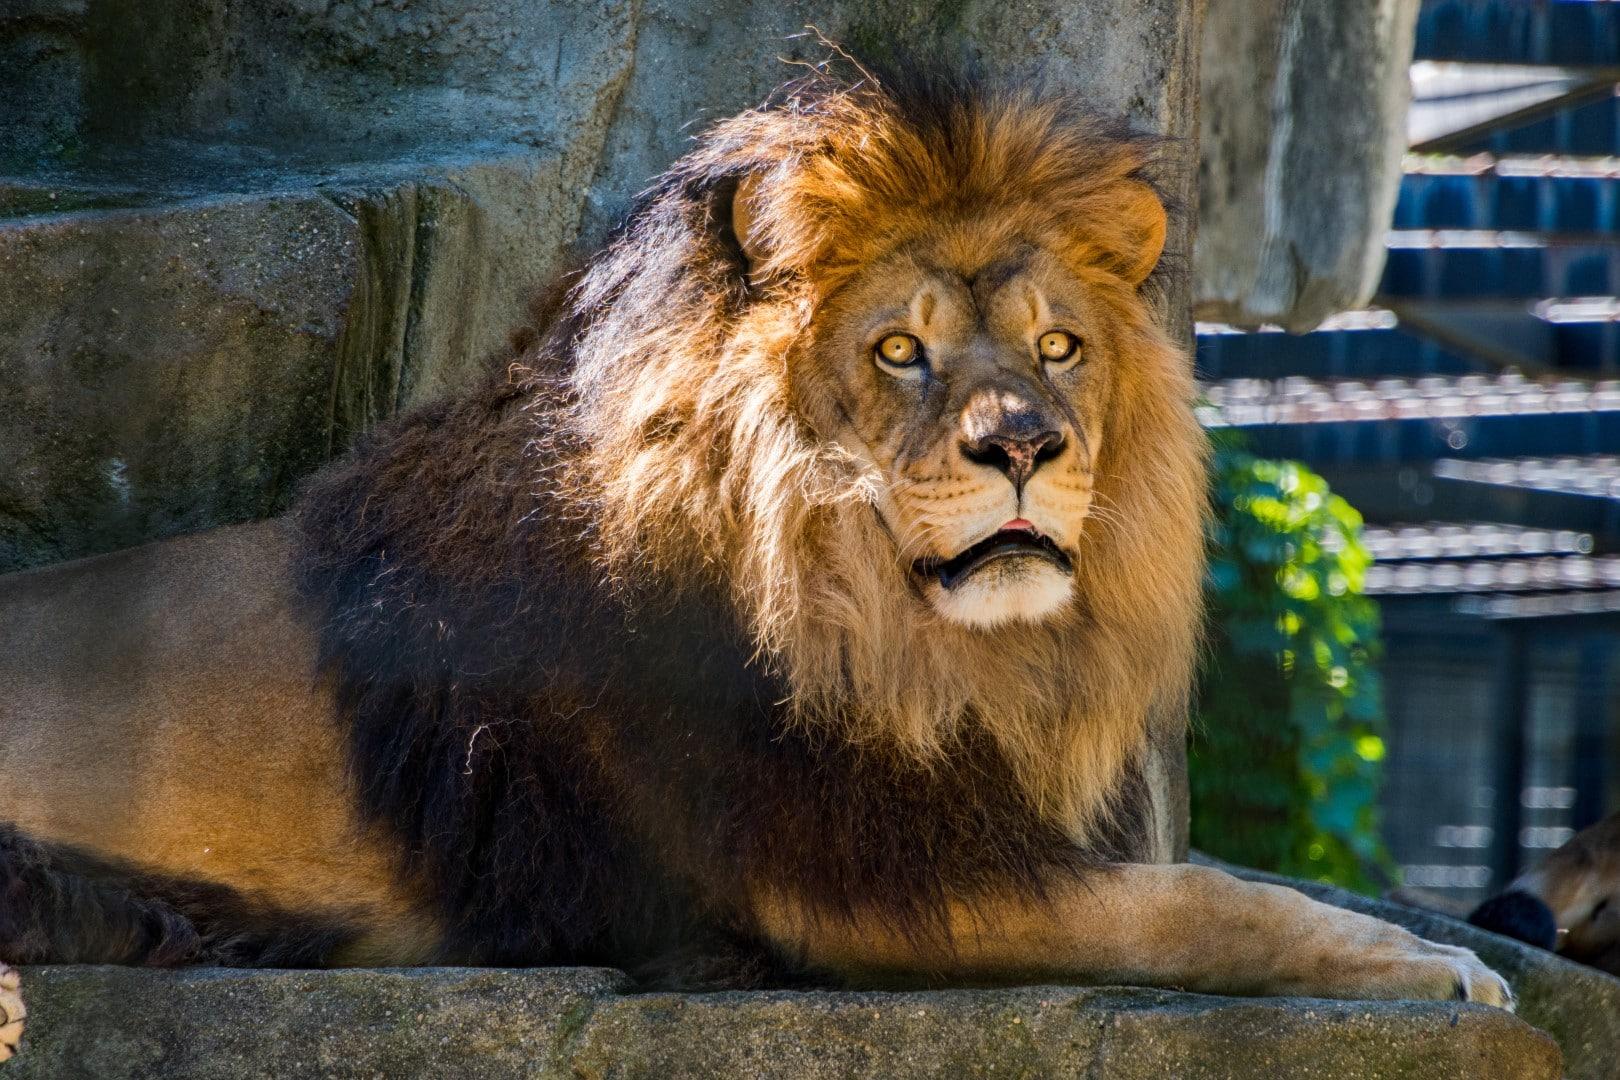 Animal detection - lion